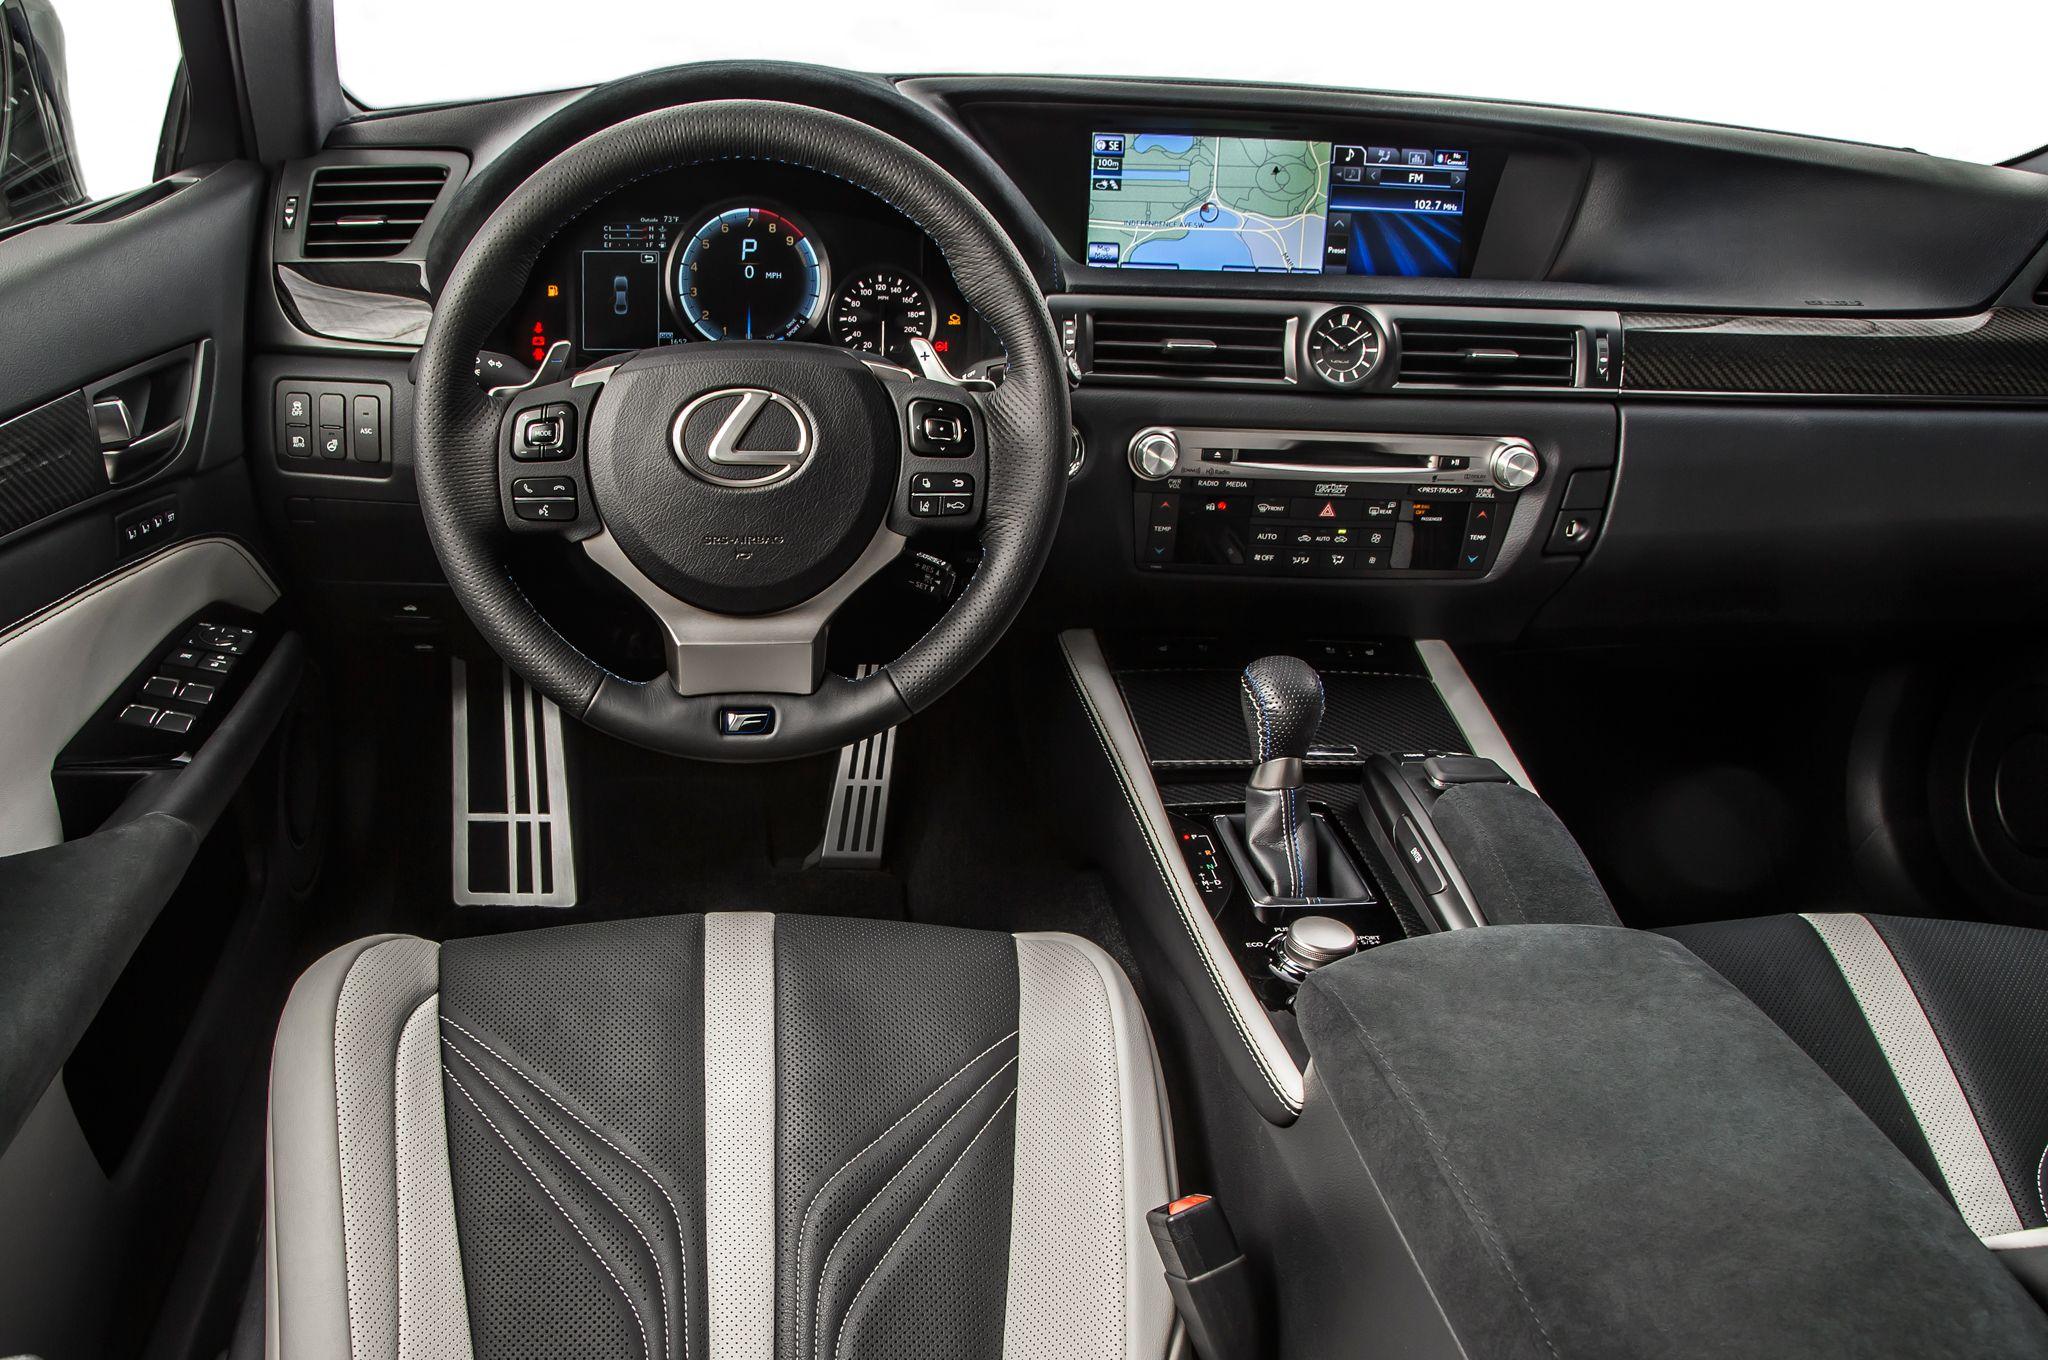 Lexus Gsf Google Search Lexus Lexus Dealer Lexus Cars